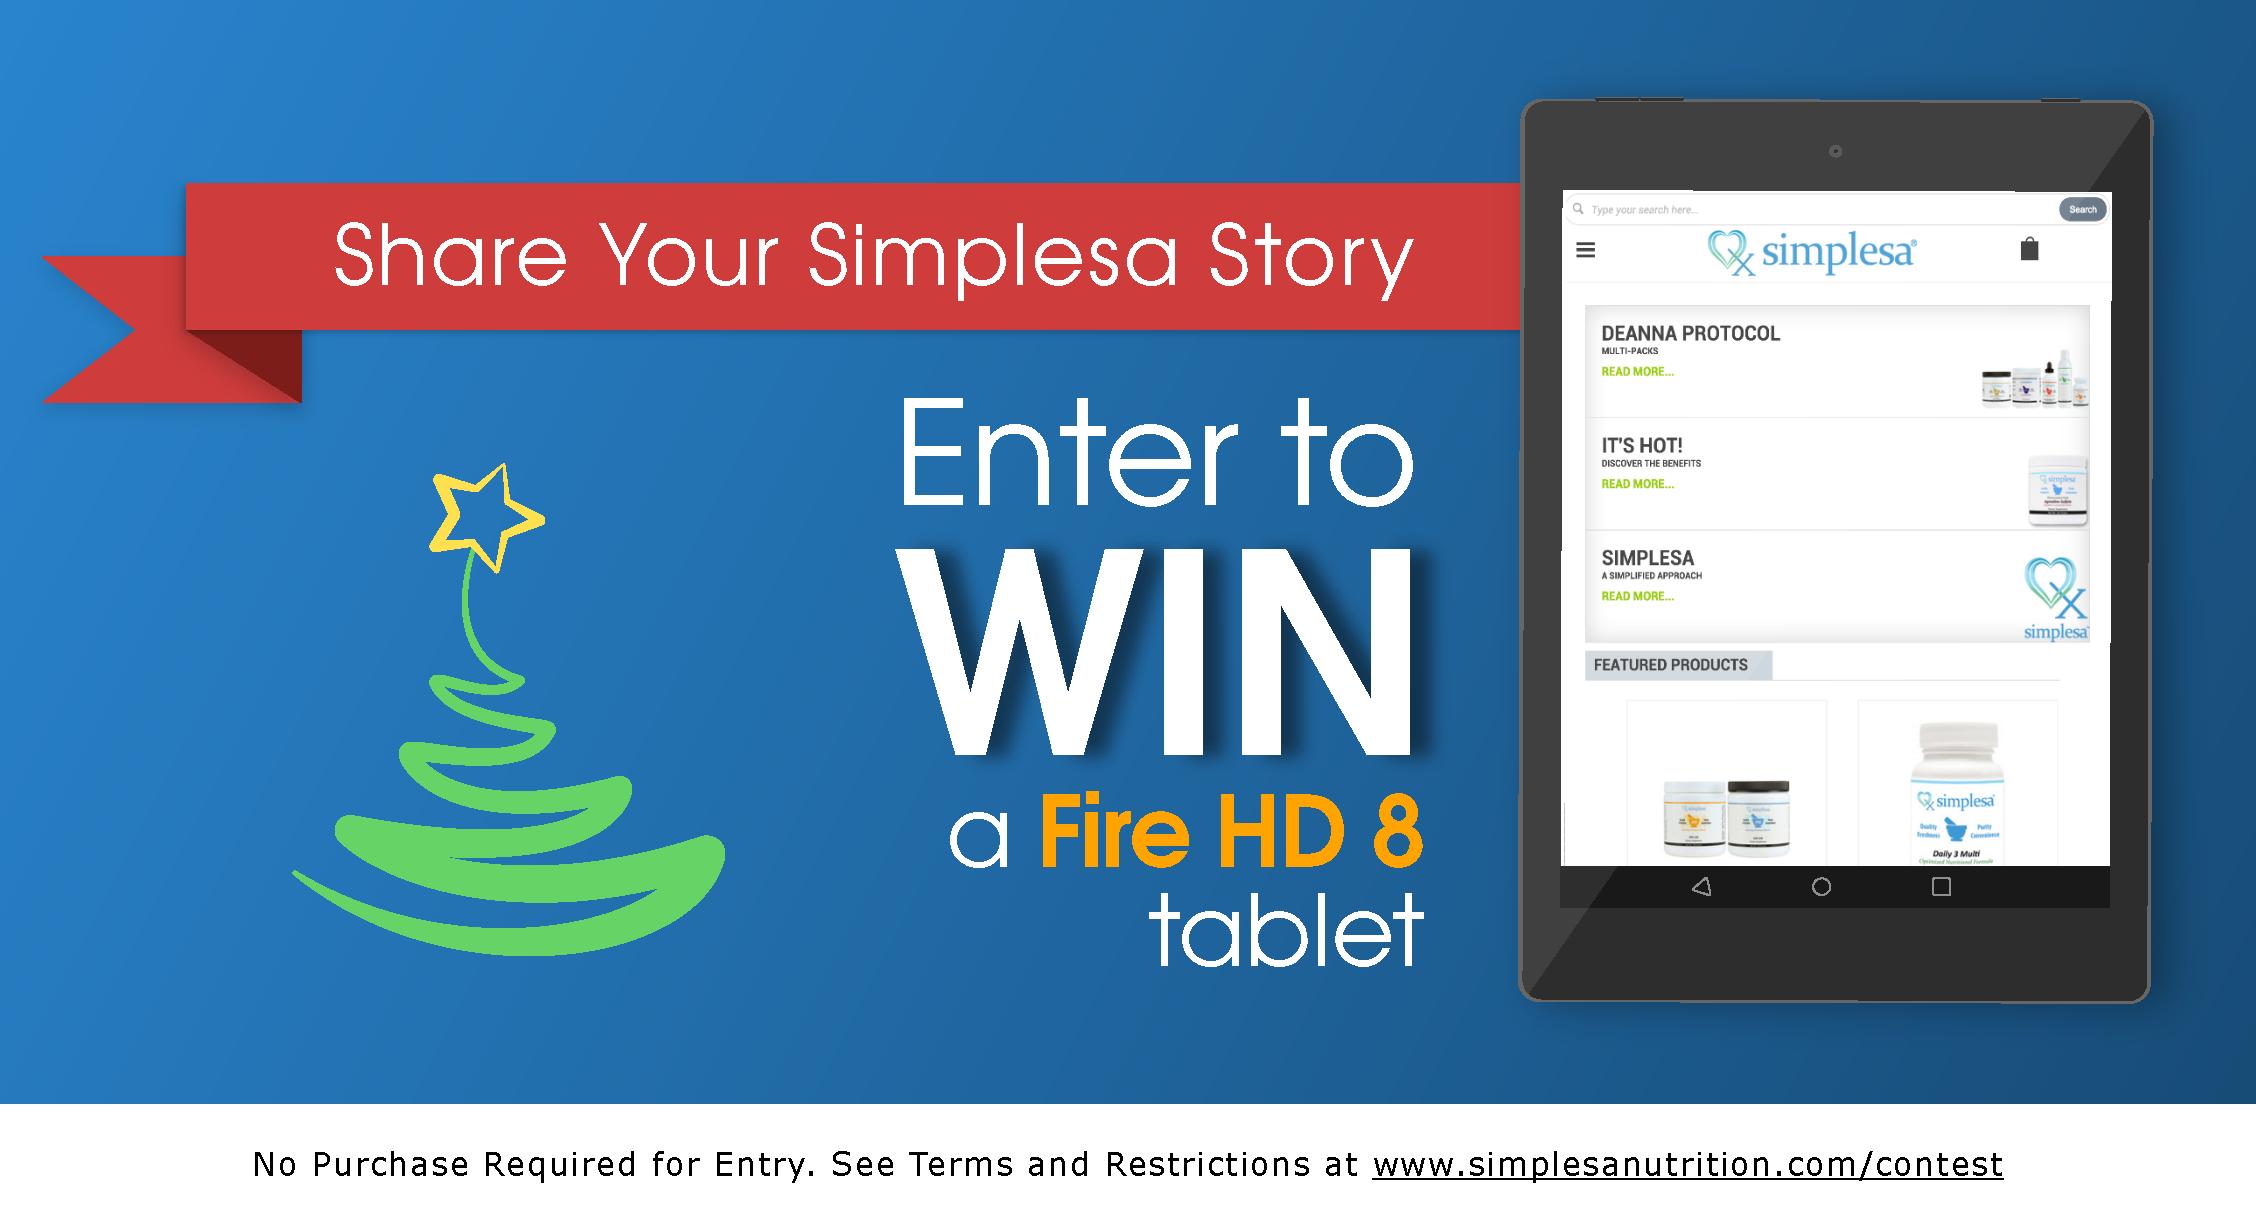 simplesa-tablet-ad-03.png